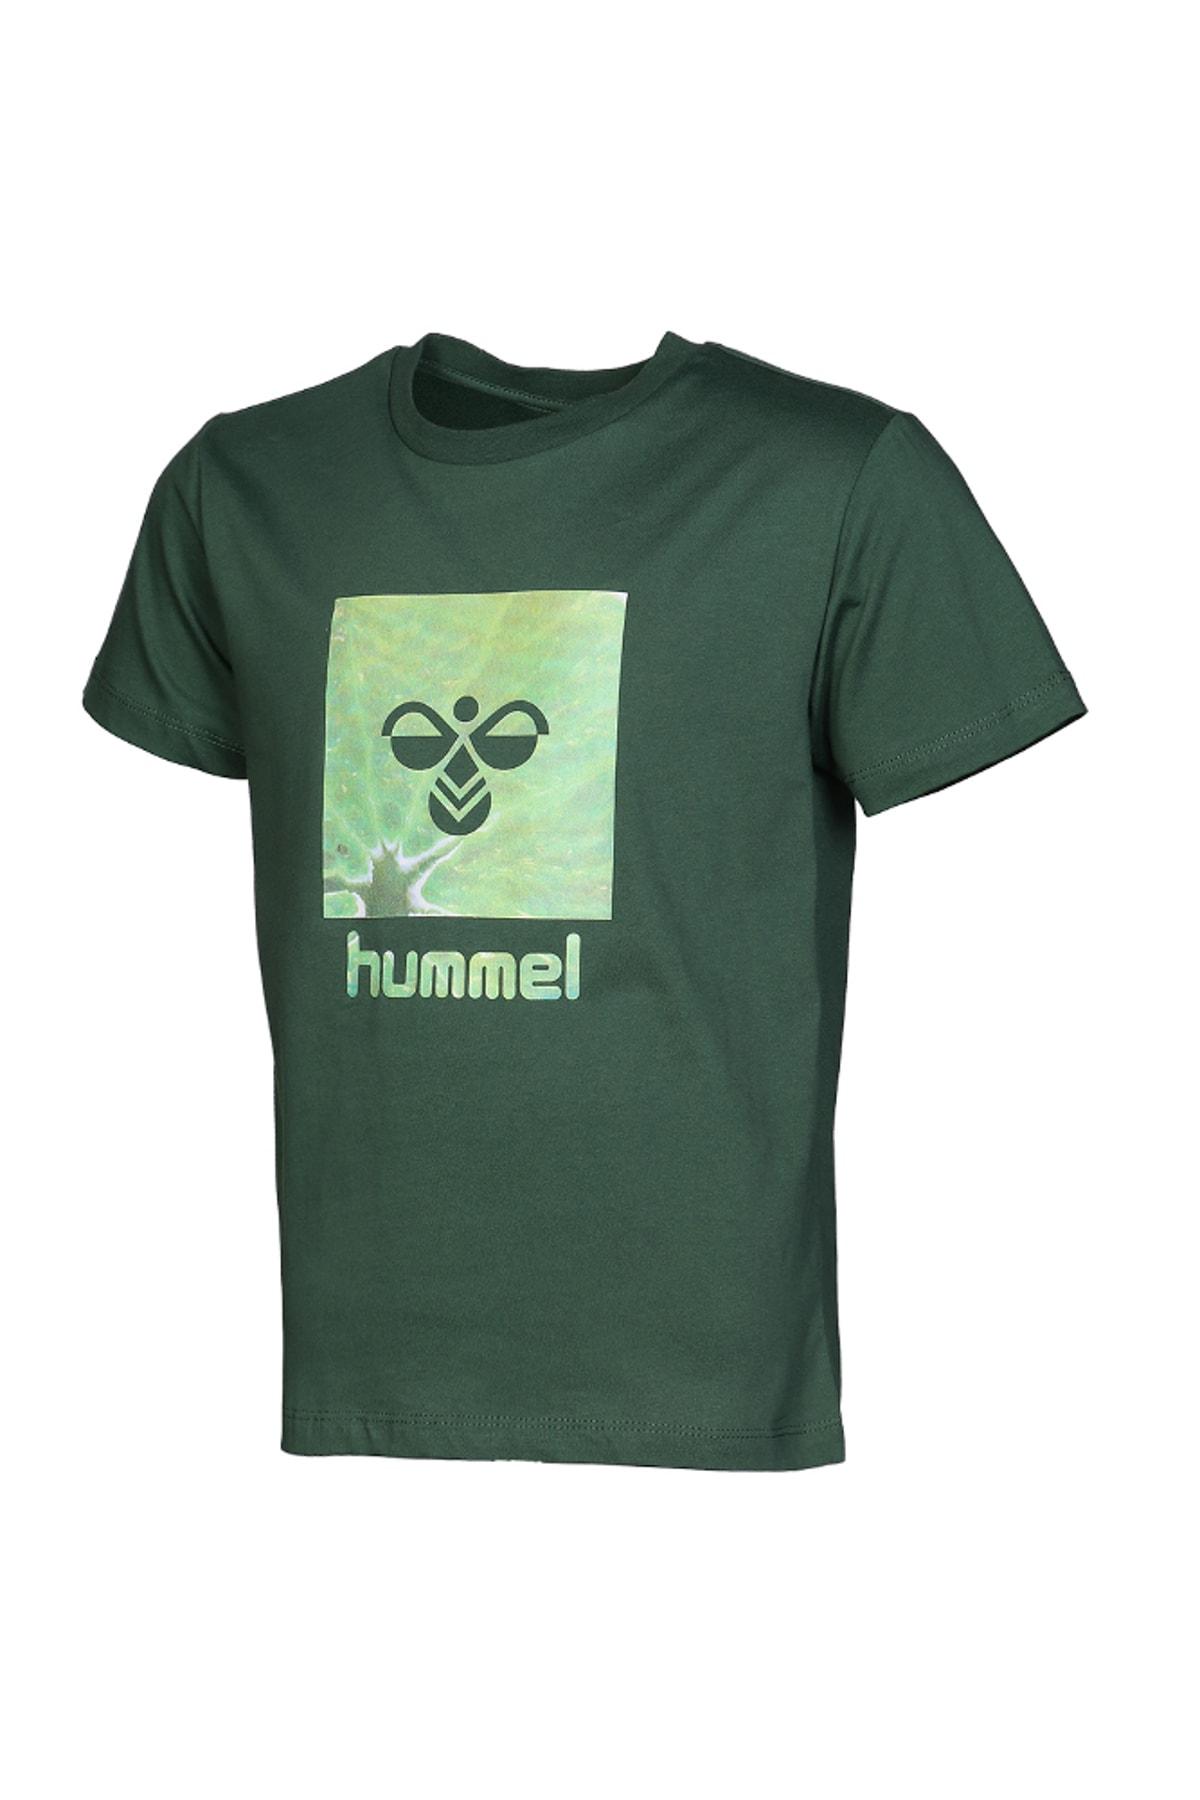 HUMMEL KIDS HML ISAGOR T-SHIRT S/S TEE 1